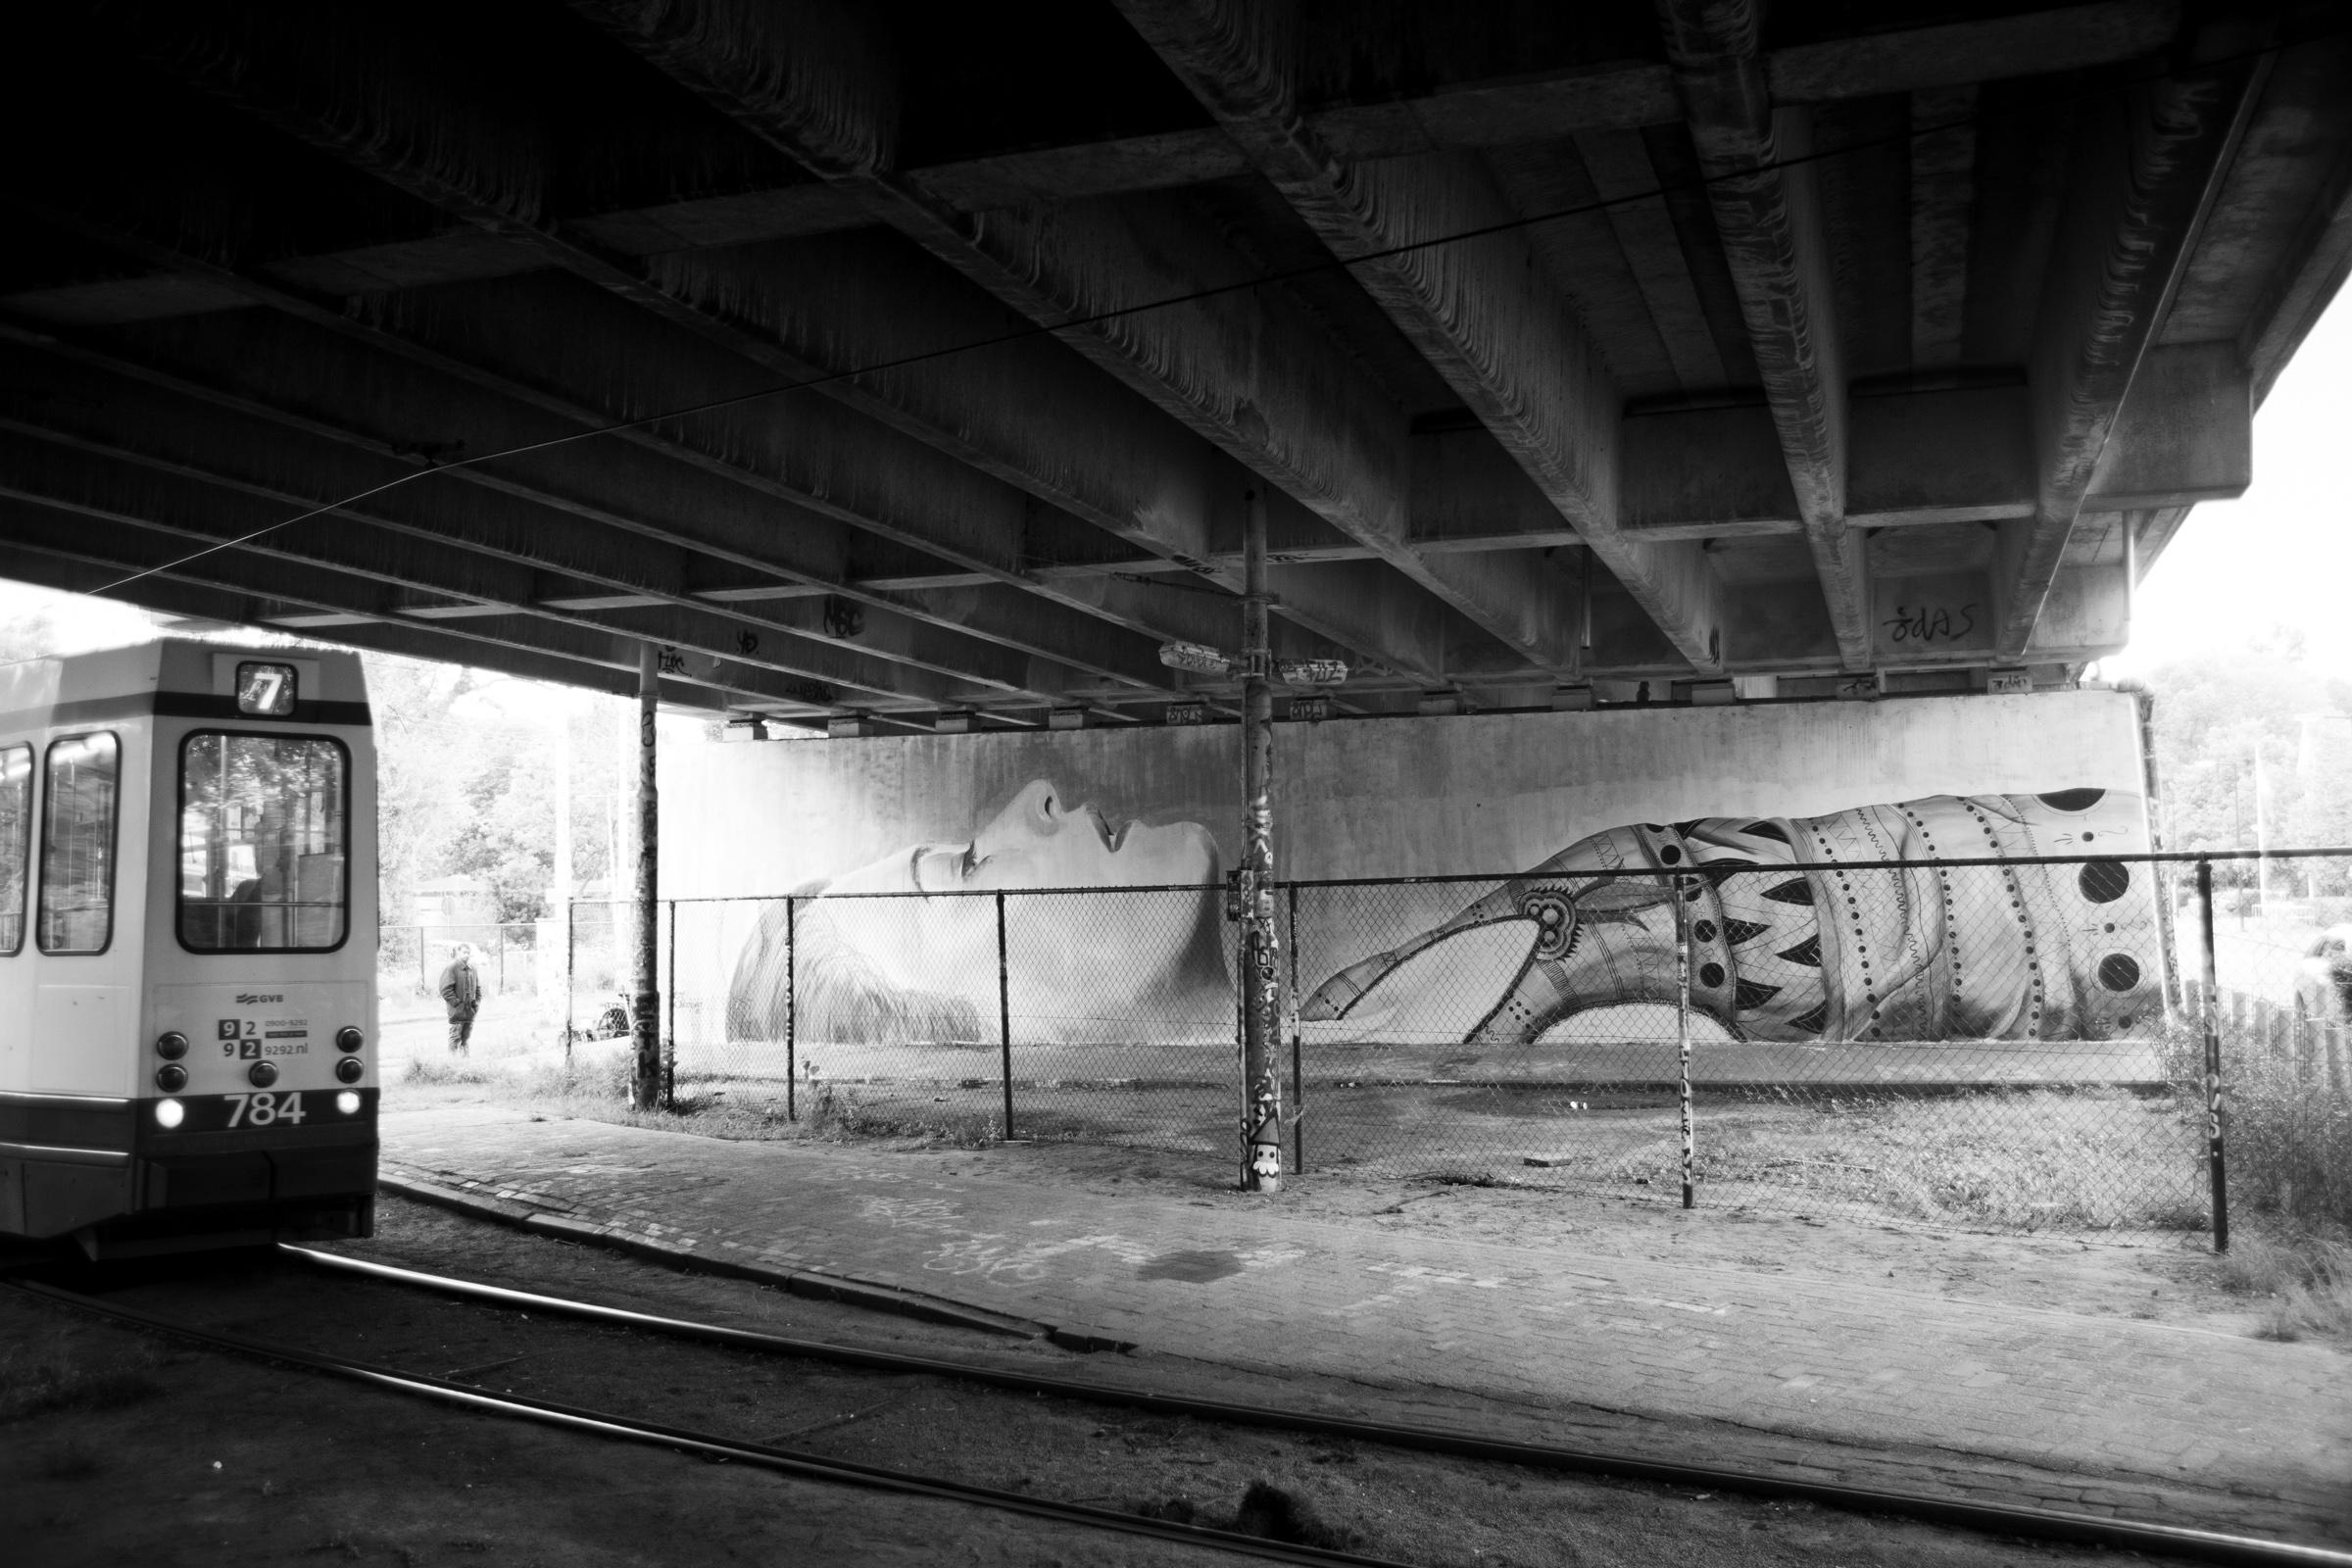 amsterdam - Street-art